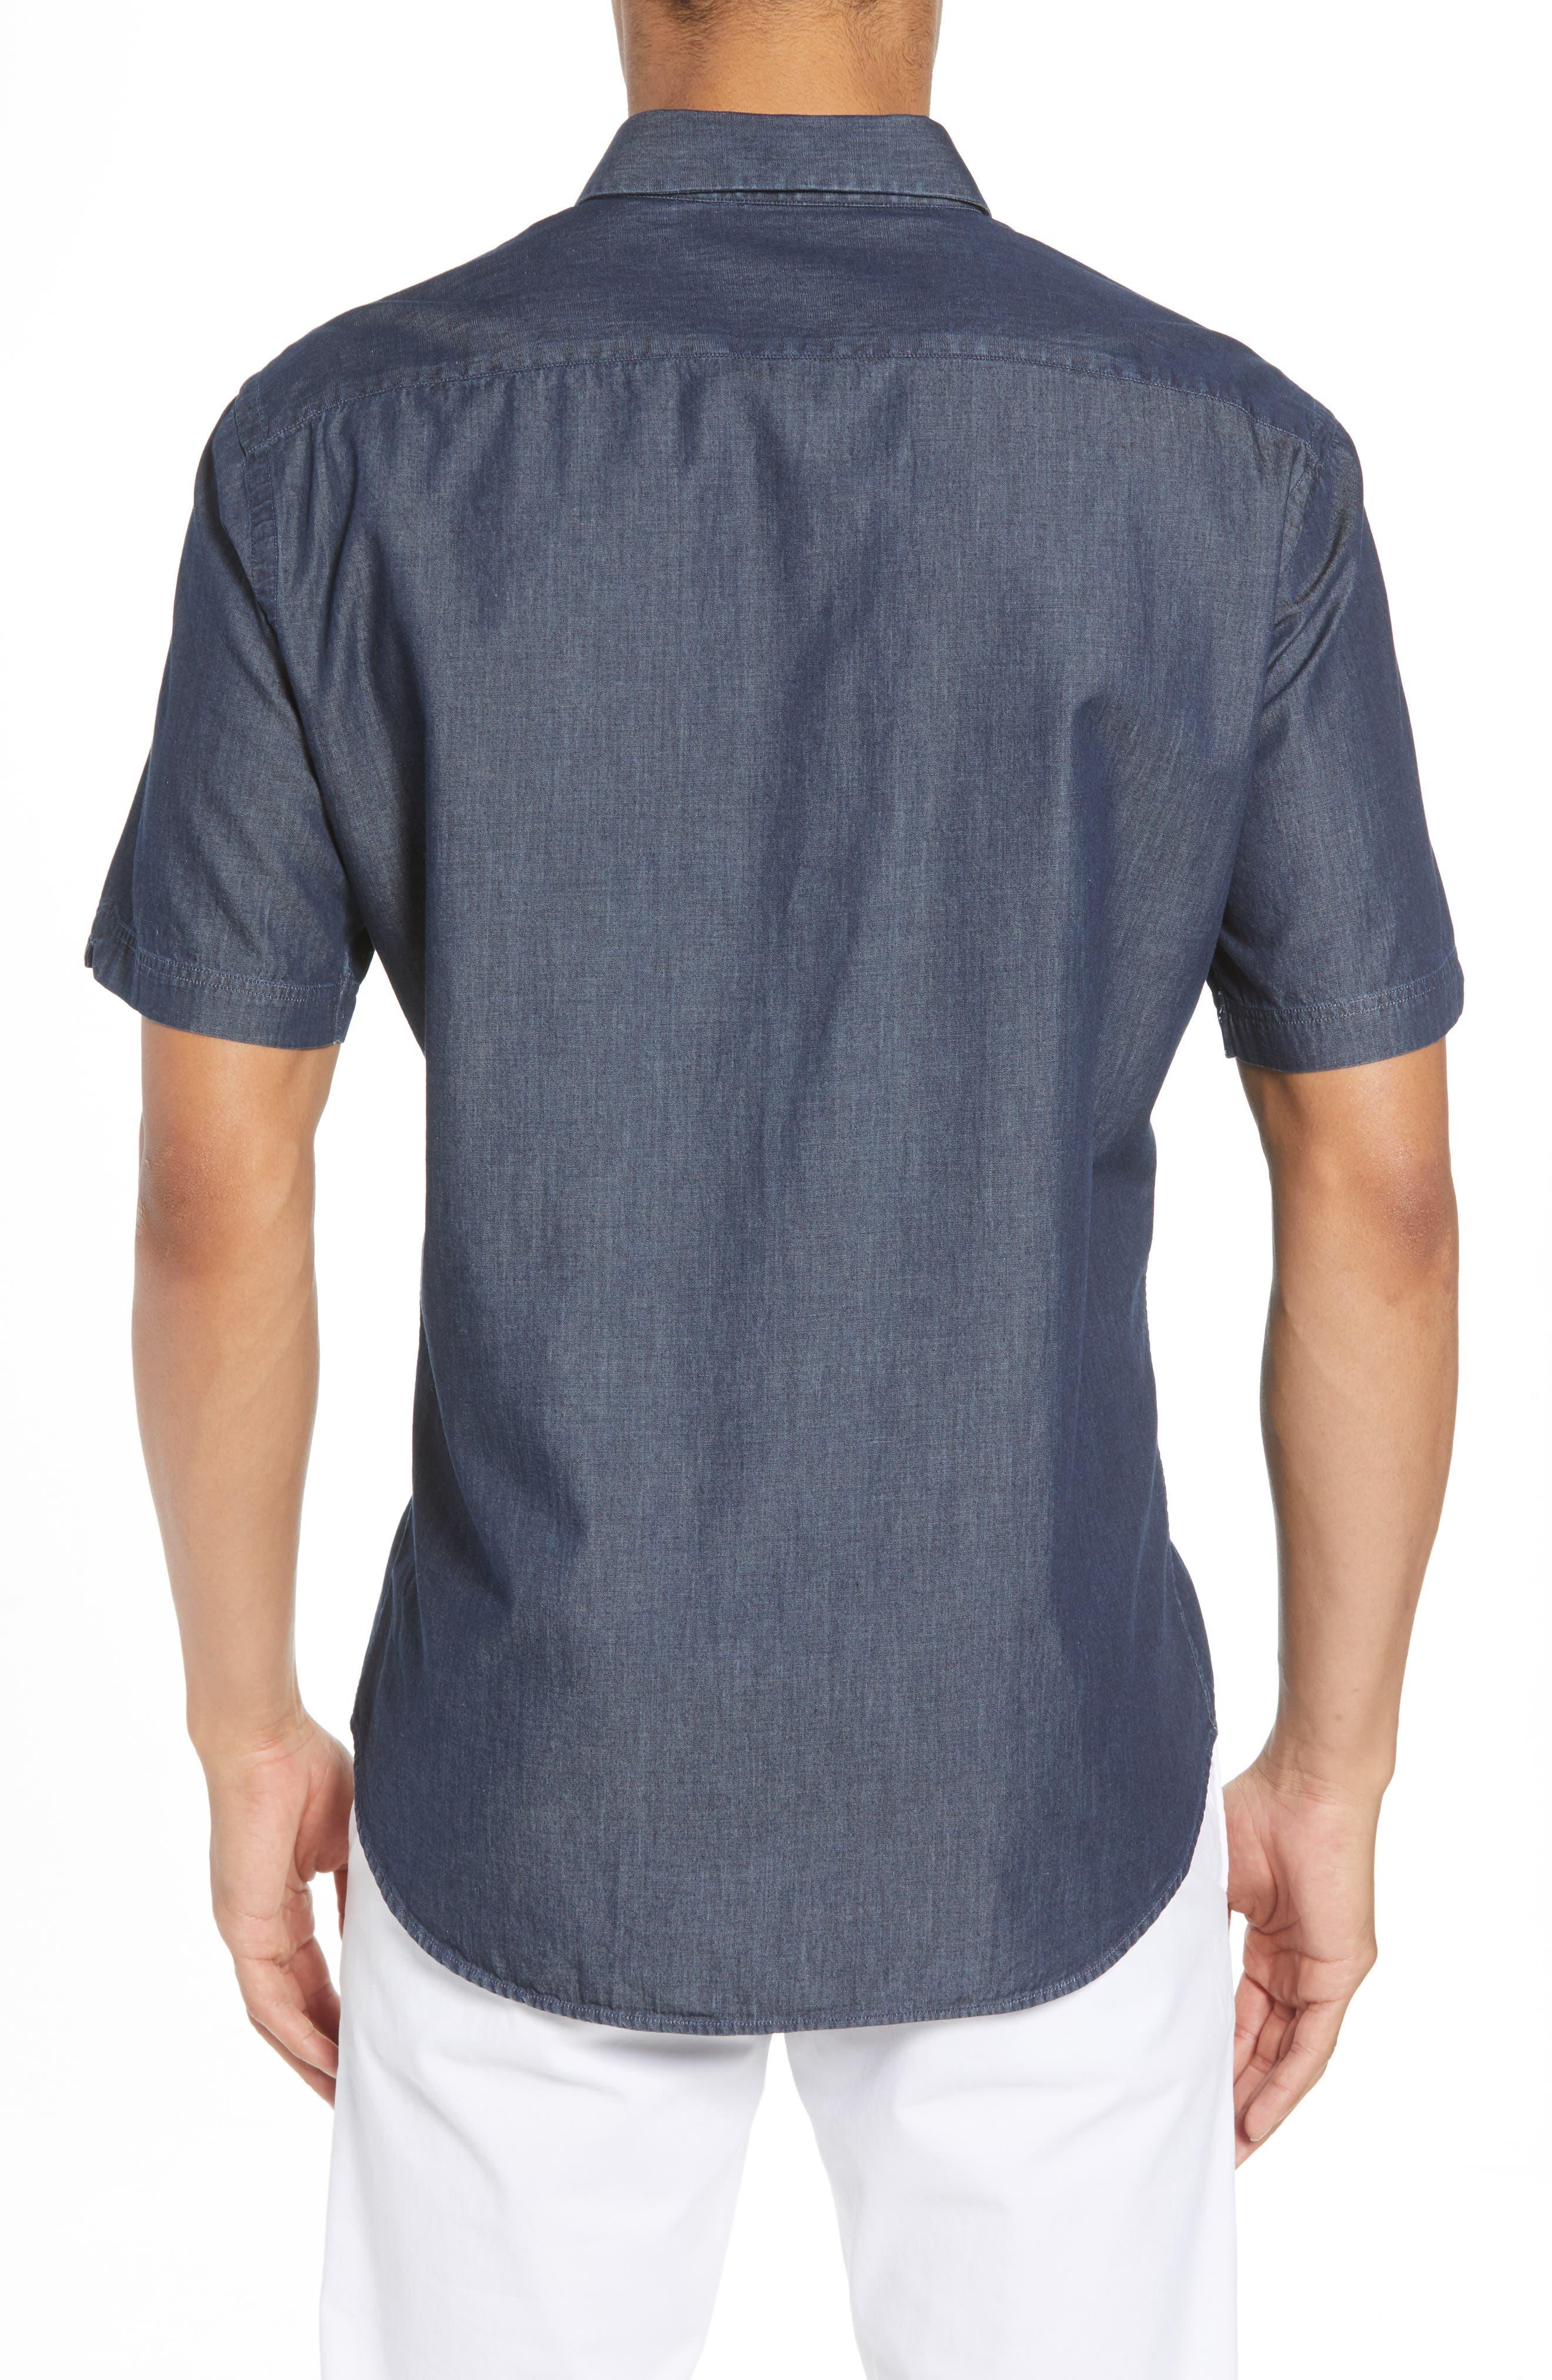 ZACHARY PRELL,                             Manolis Denim Sport Shirt,                             Alternate thumbnail 2, color,                             471